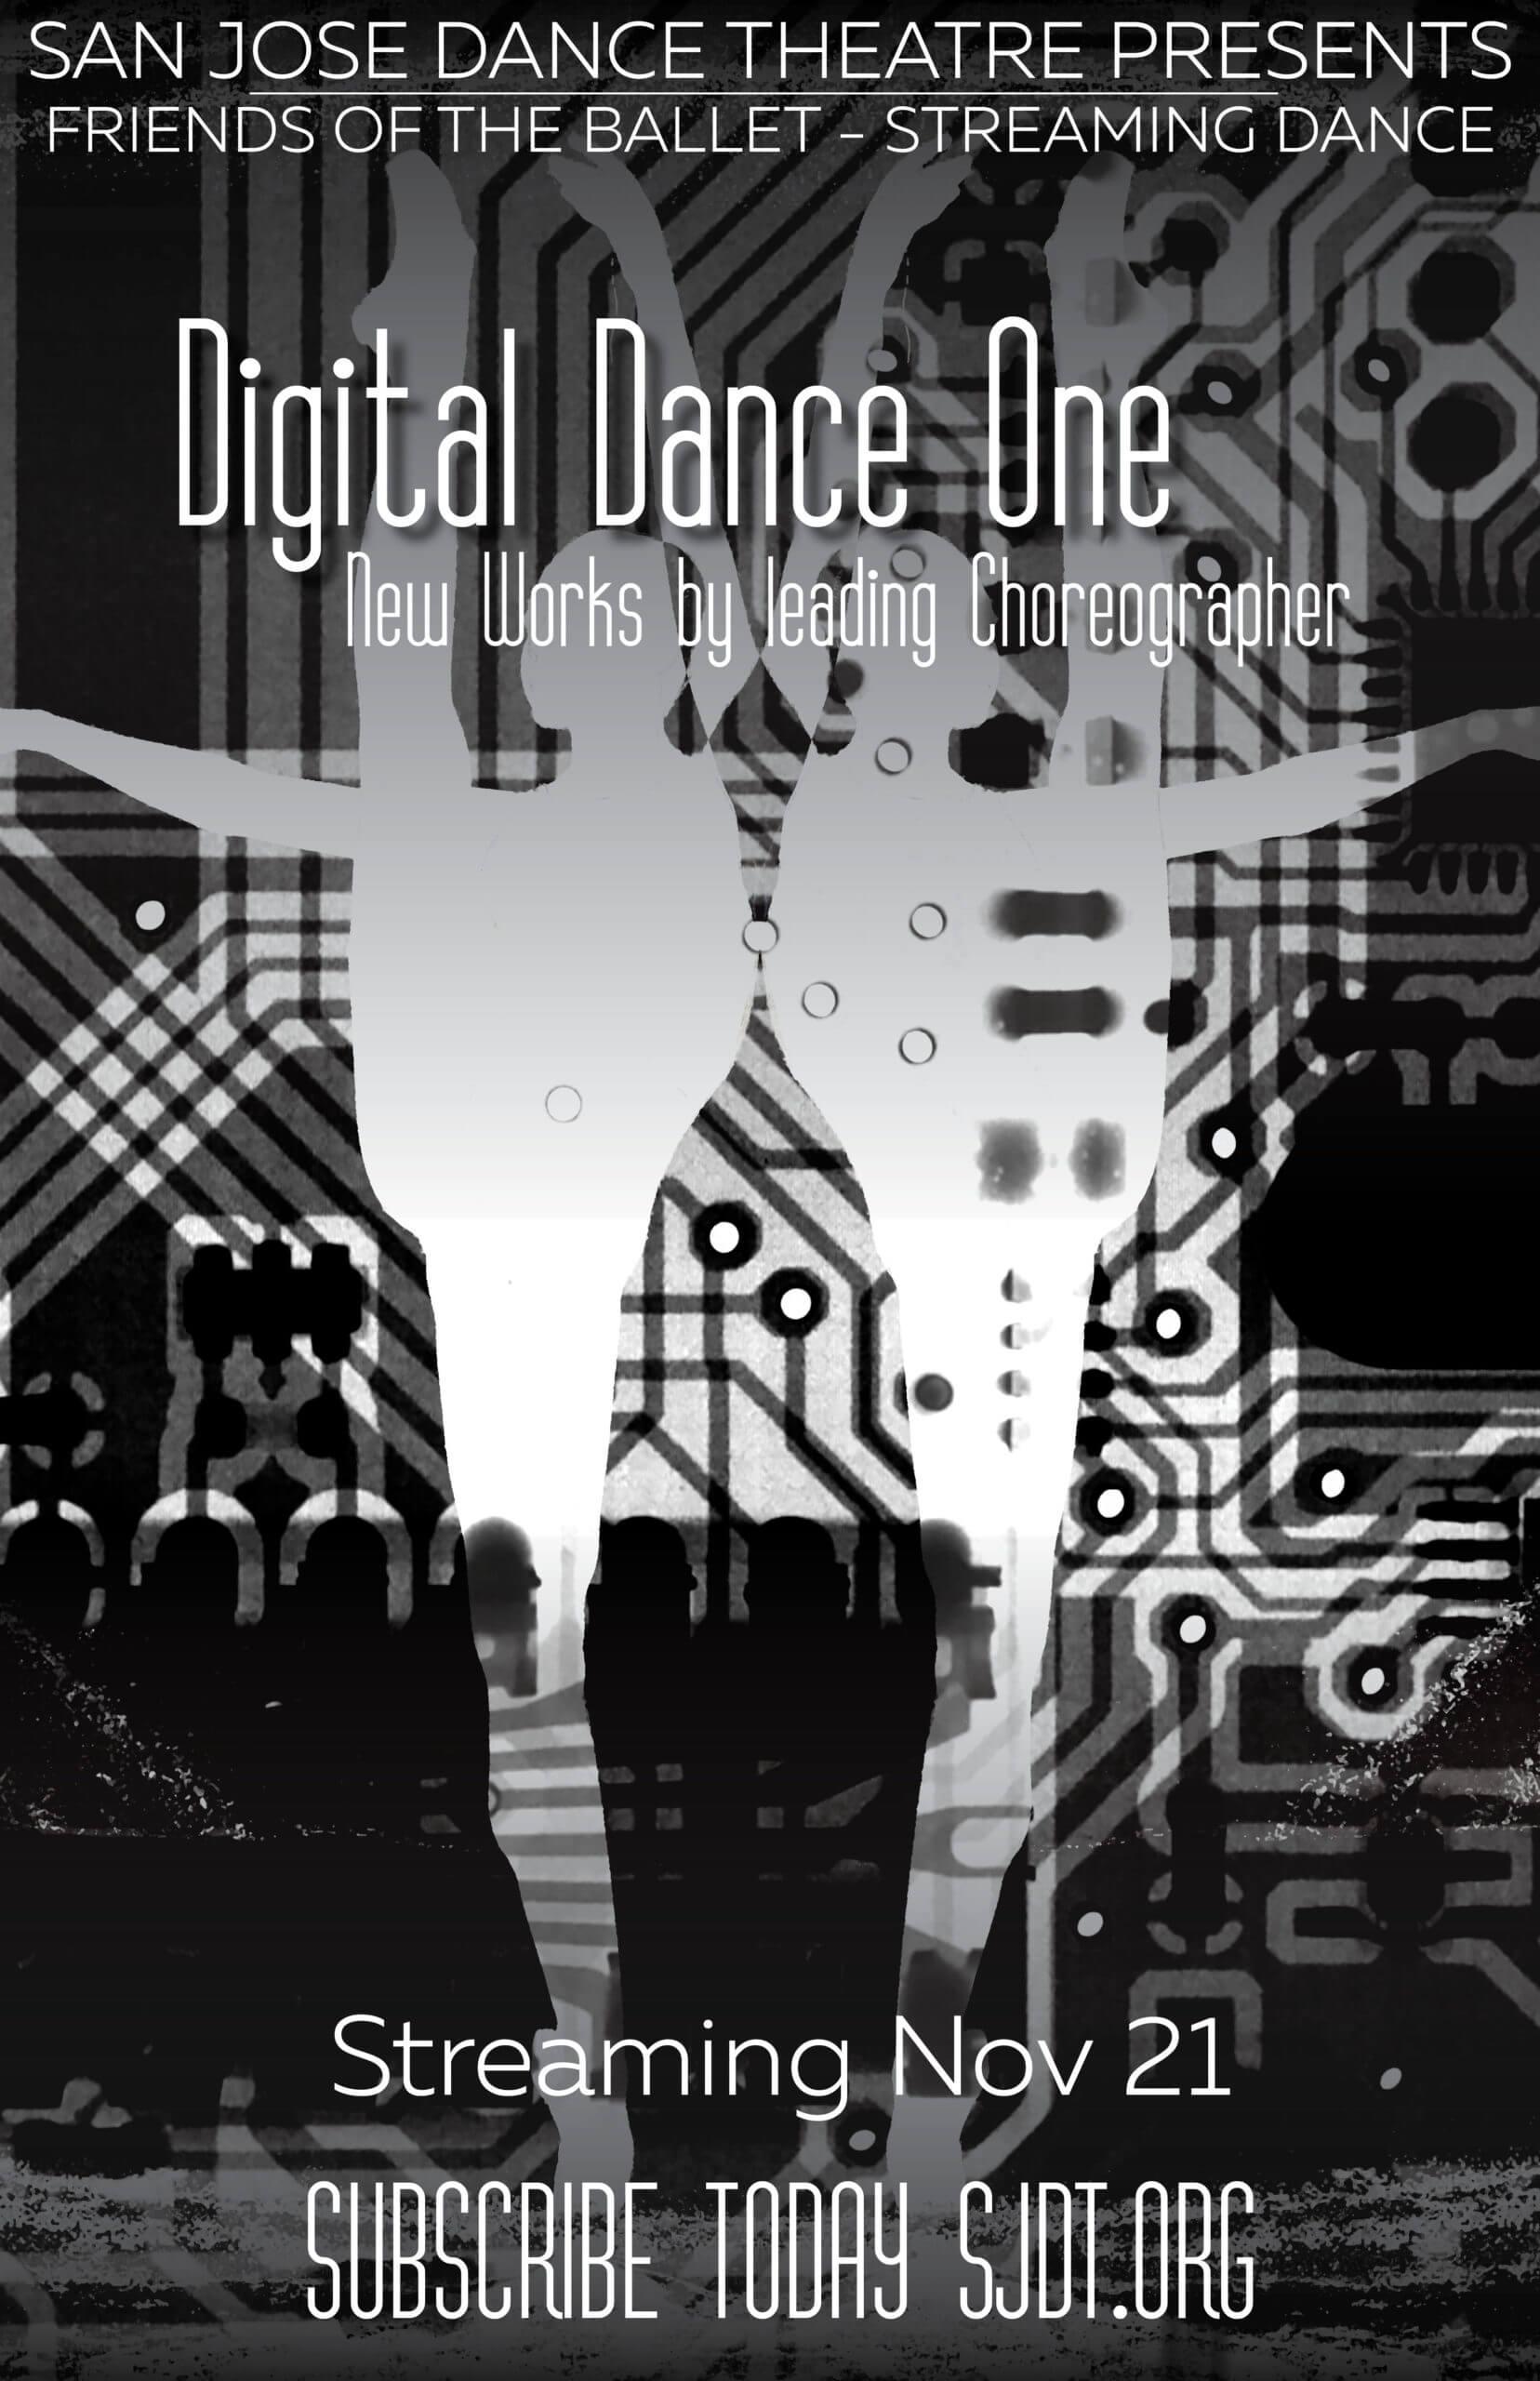 Digital Dance 1